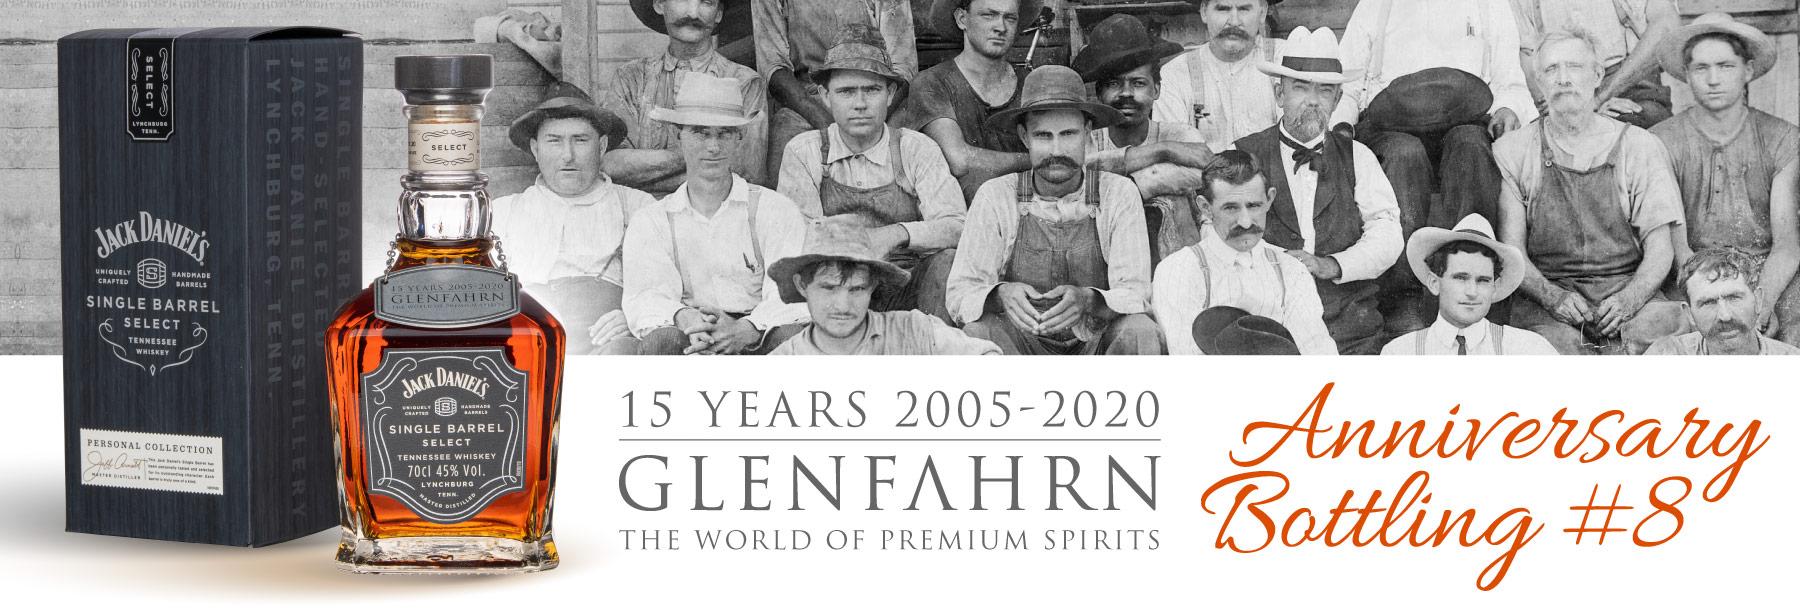 Glen Fahrn 15th Anniversary Bottling #8 Jack Daniel's Jubiläumsabfüllung Bourbon Amerika